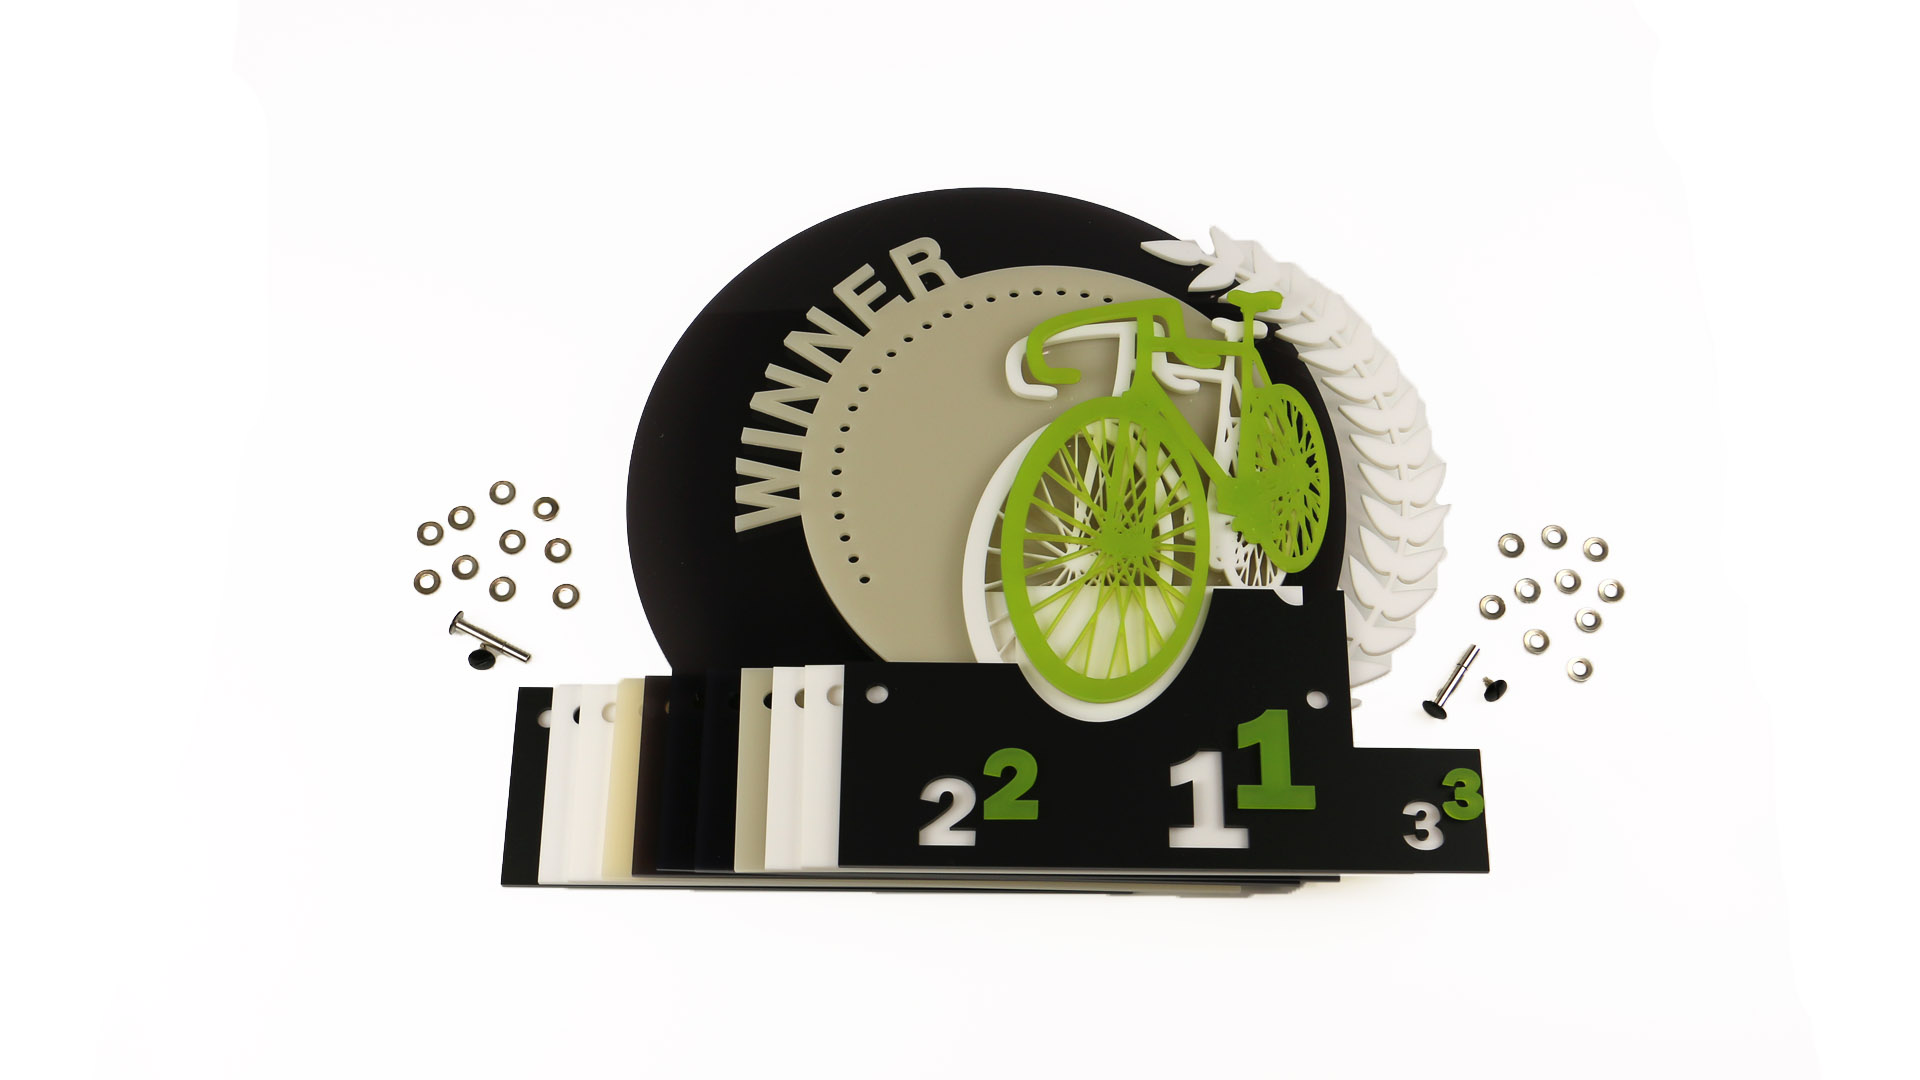 Anleitung für den Acrylglas Pokal